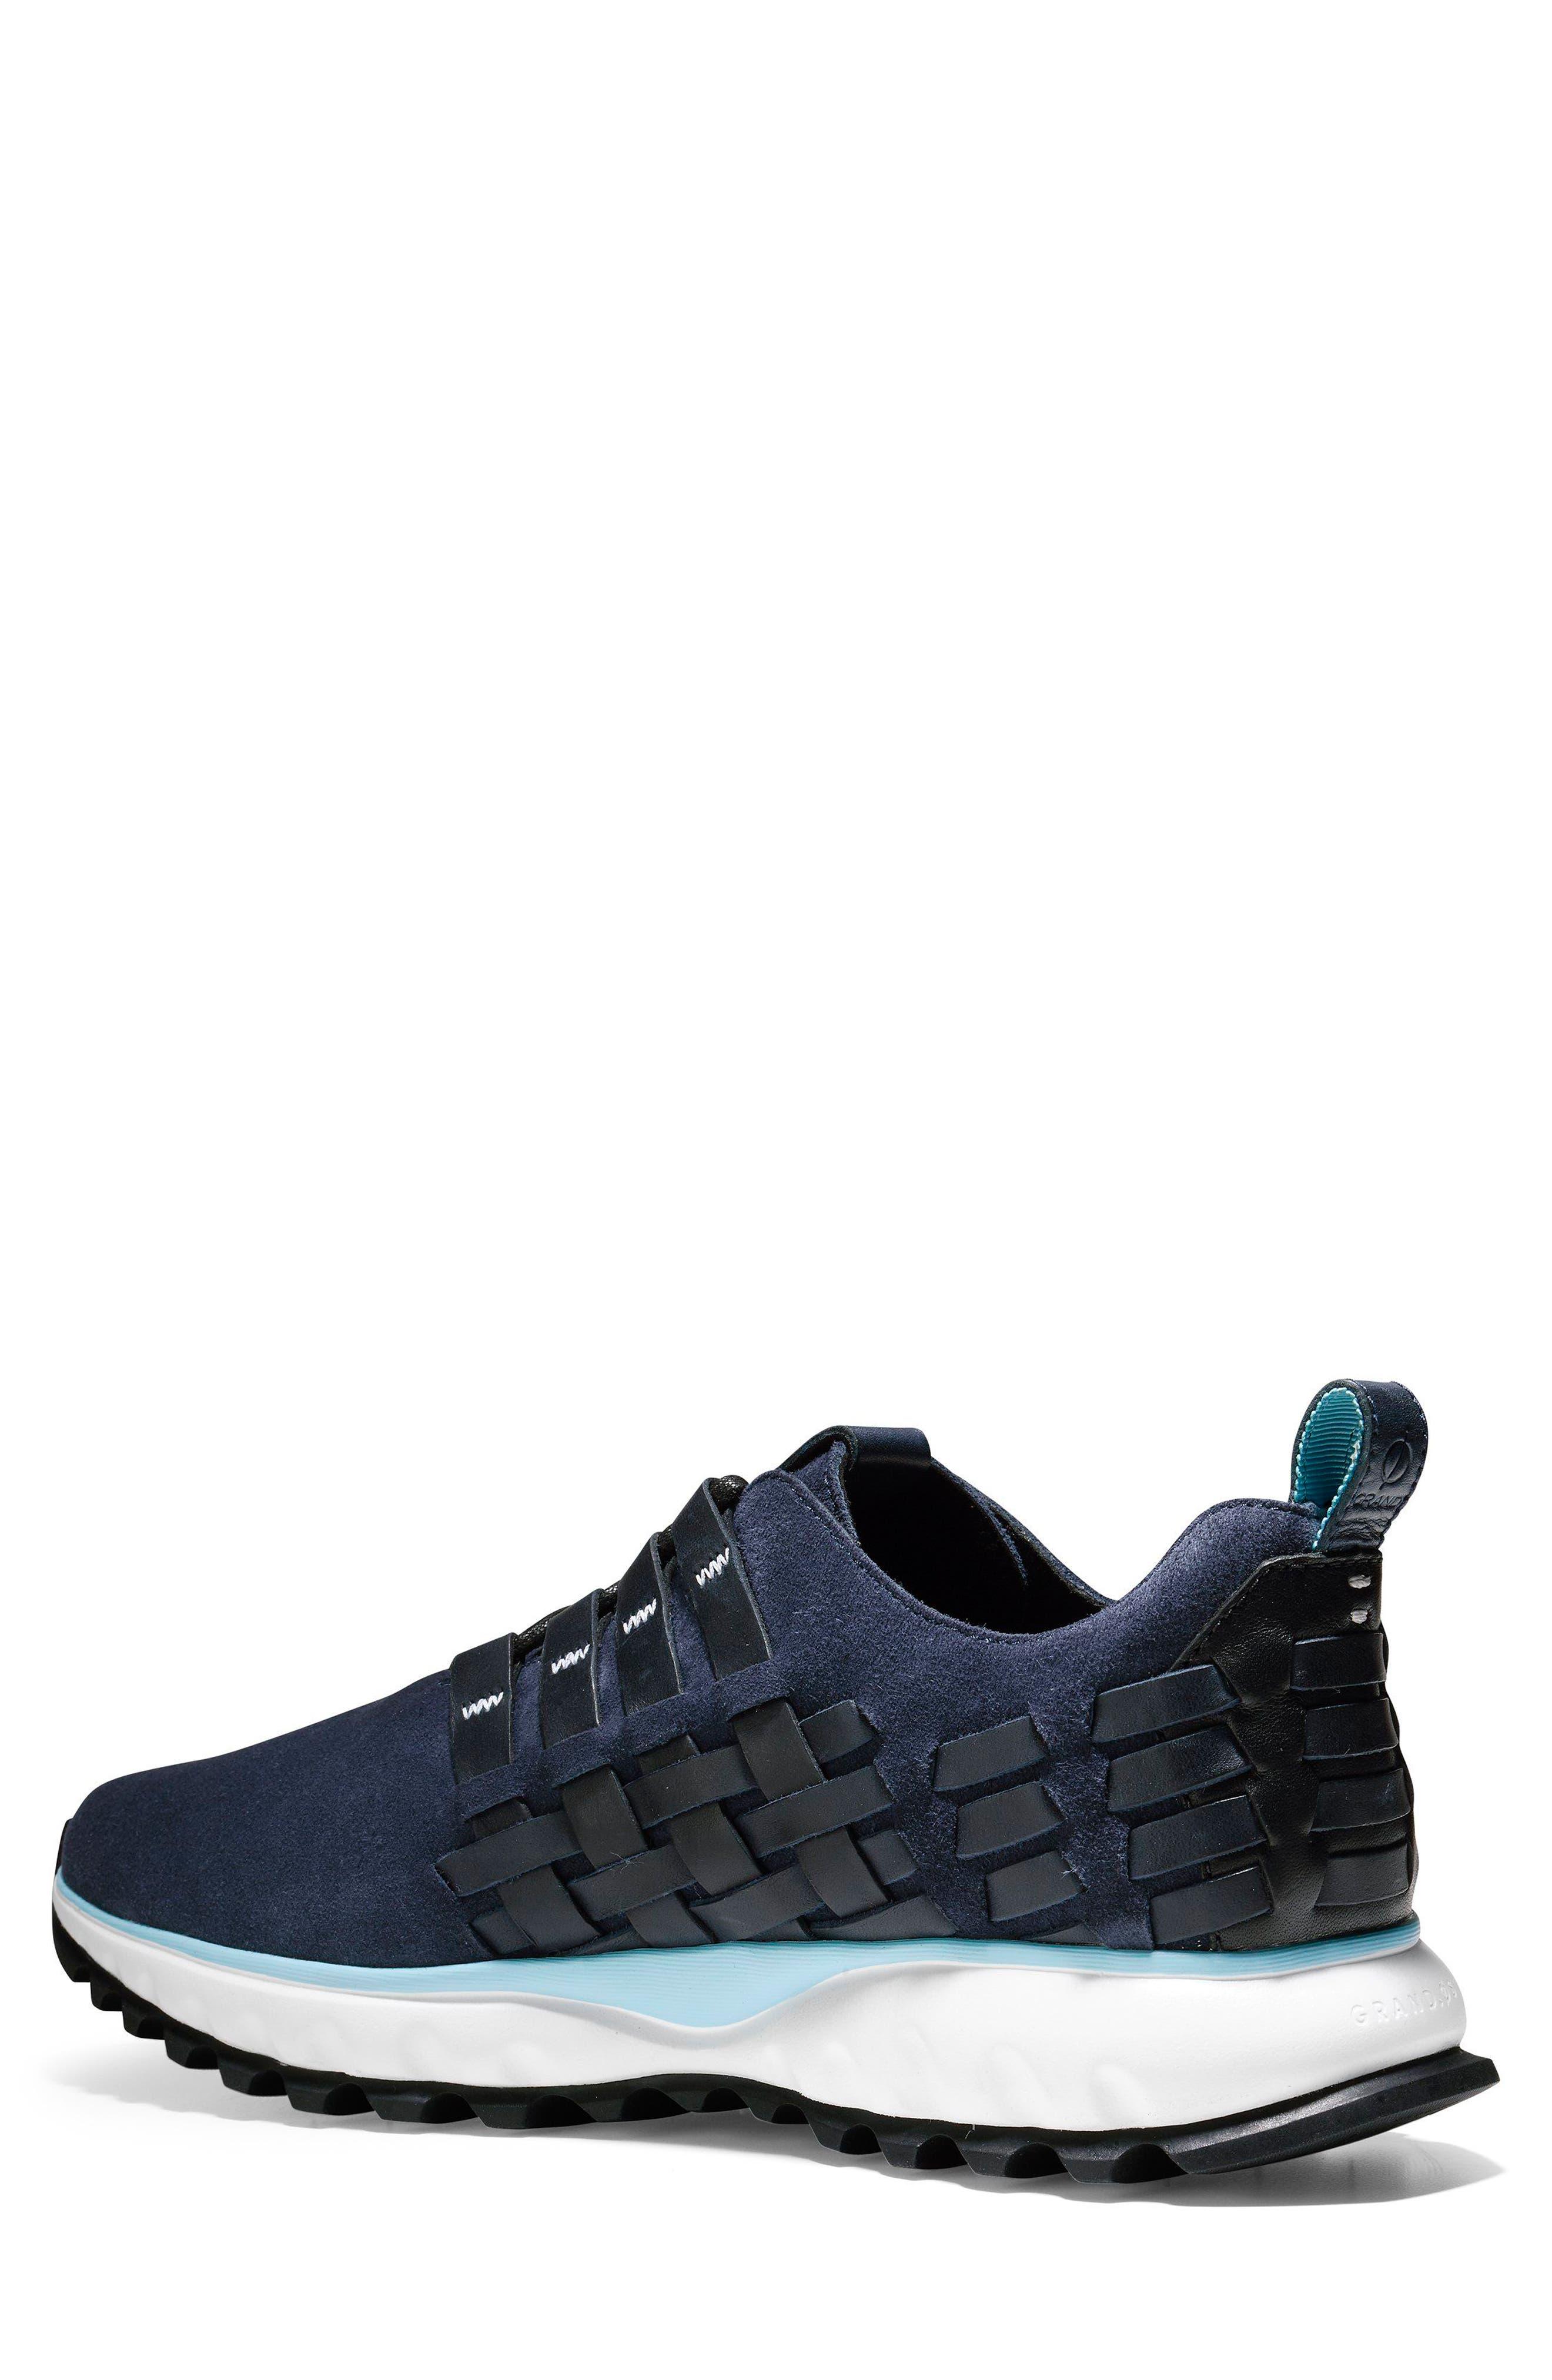 GrandExplore All Terrain Woven Sneaker,                             Alternate thumbnail 2, color,                             Marine Blue/Optic White/Black